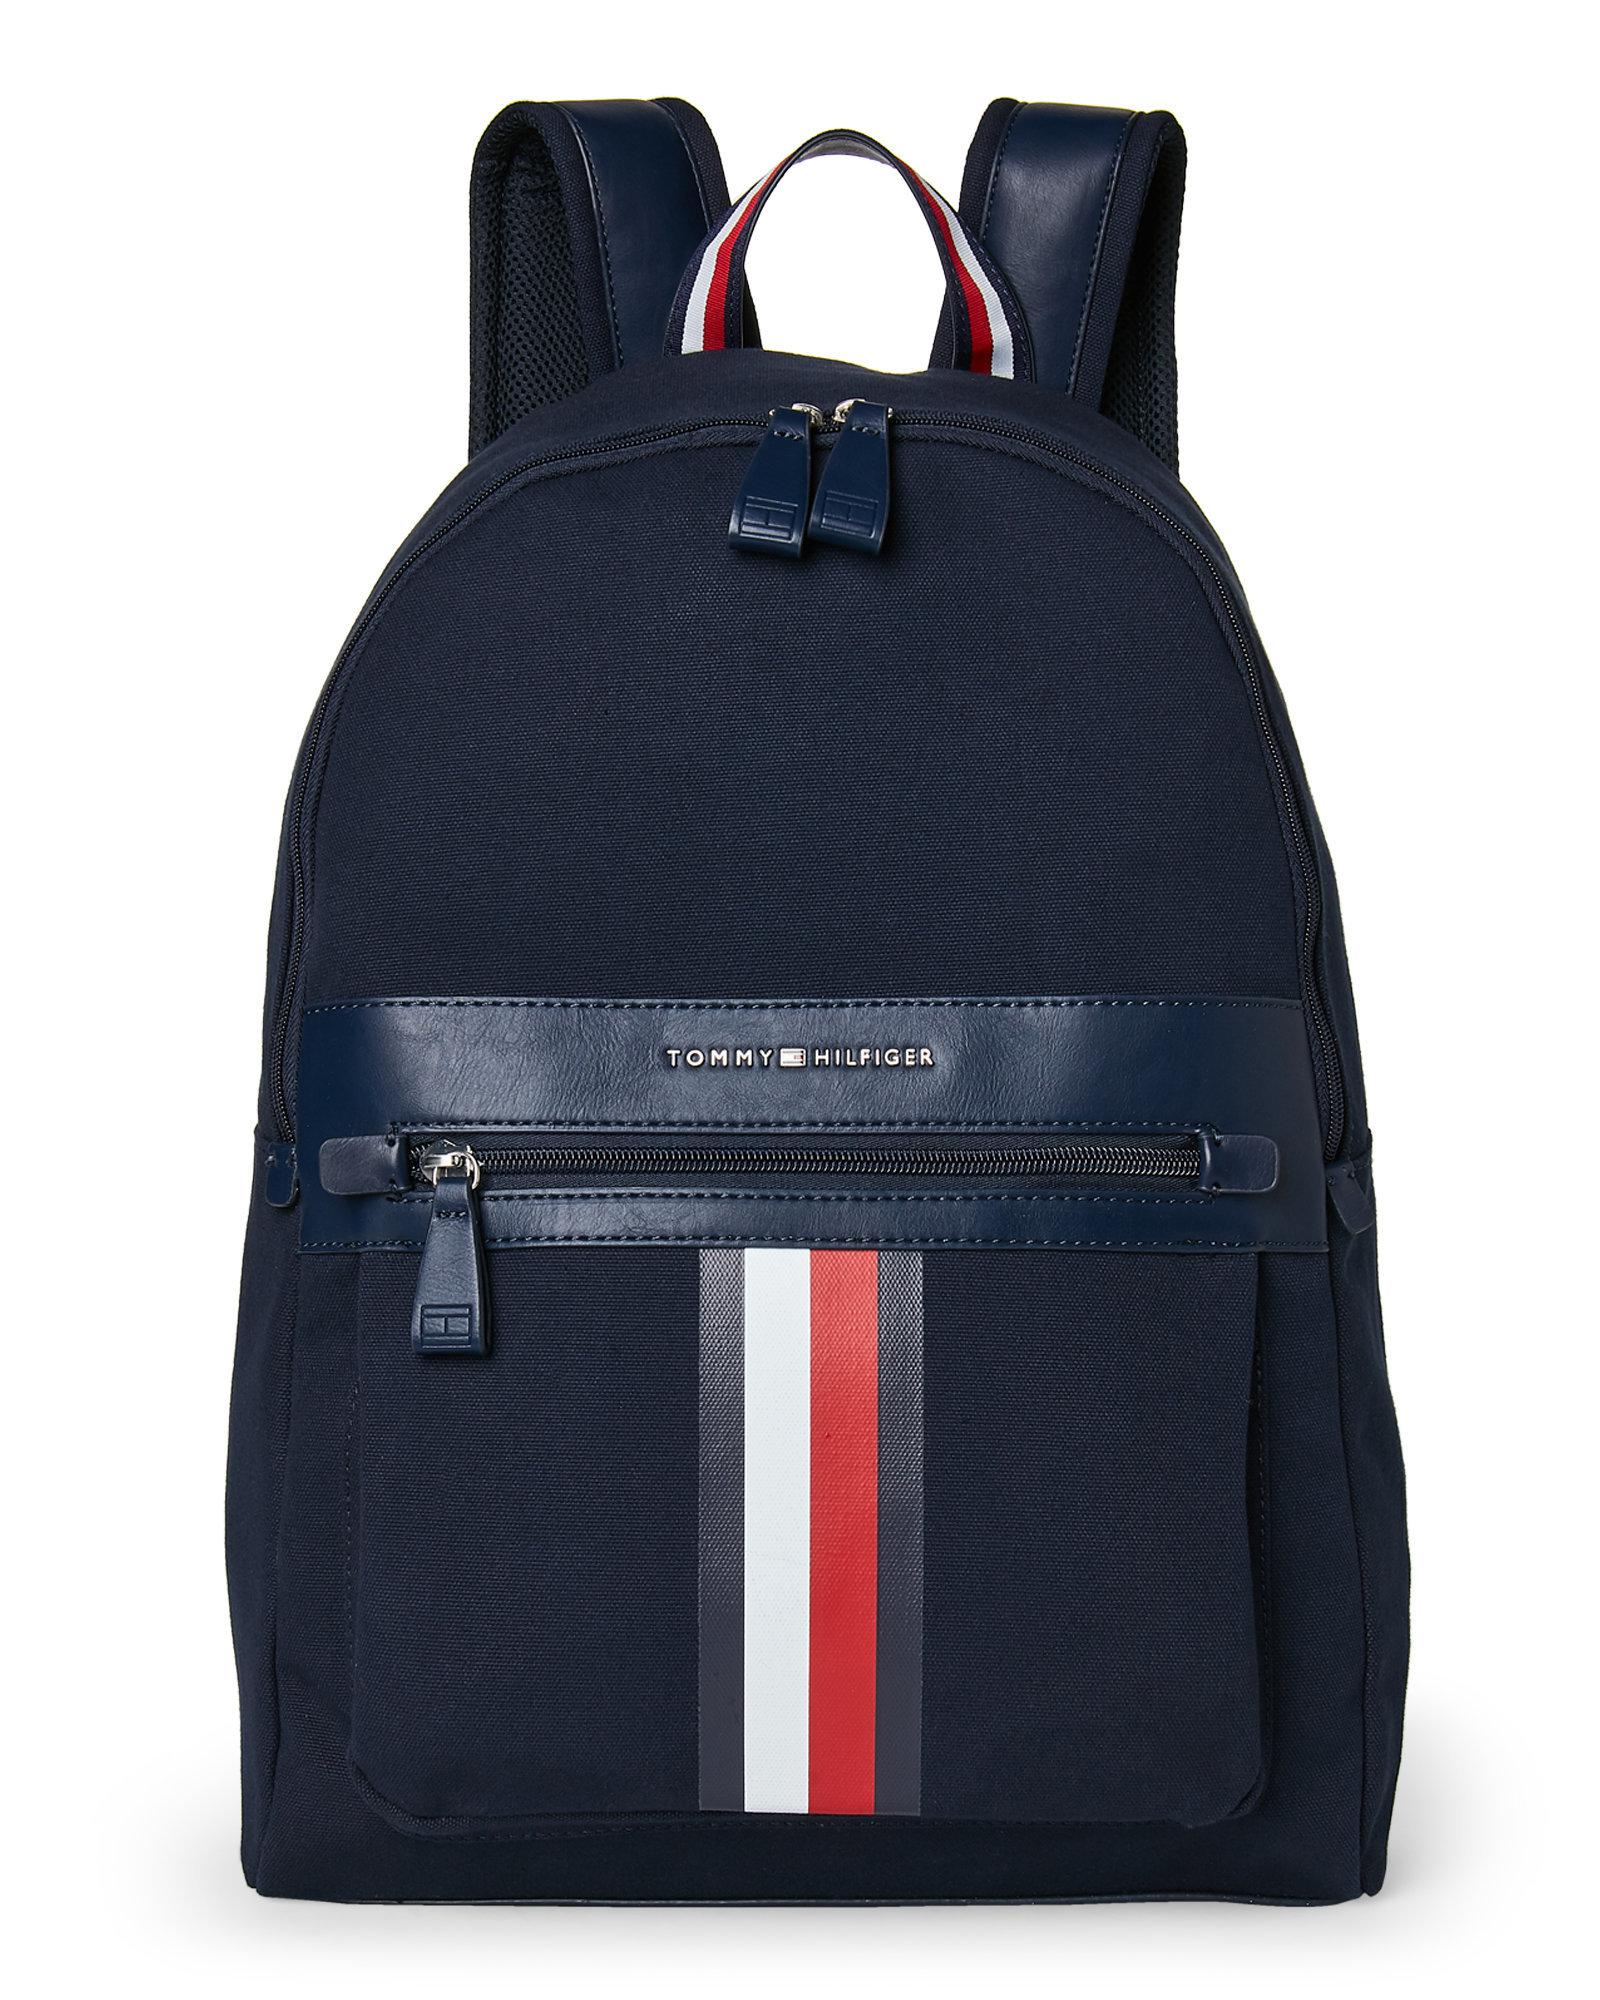 lyst tommy hilfiger icon laptop canvas backpack in blue. Black Bedroom Furniture Sets. Home Design Ideas